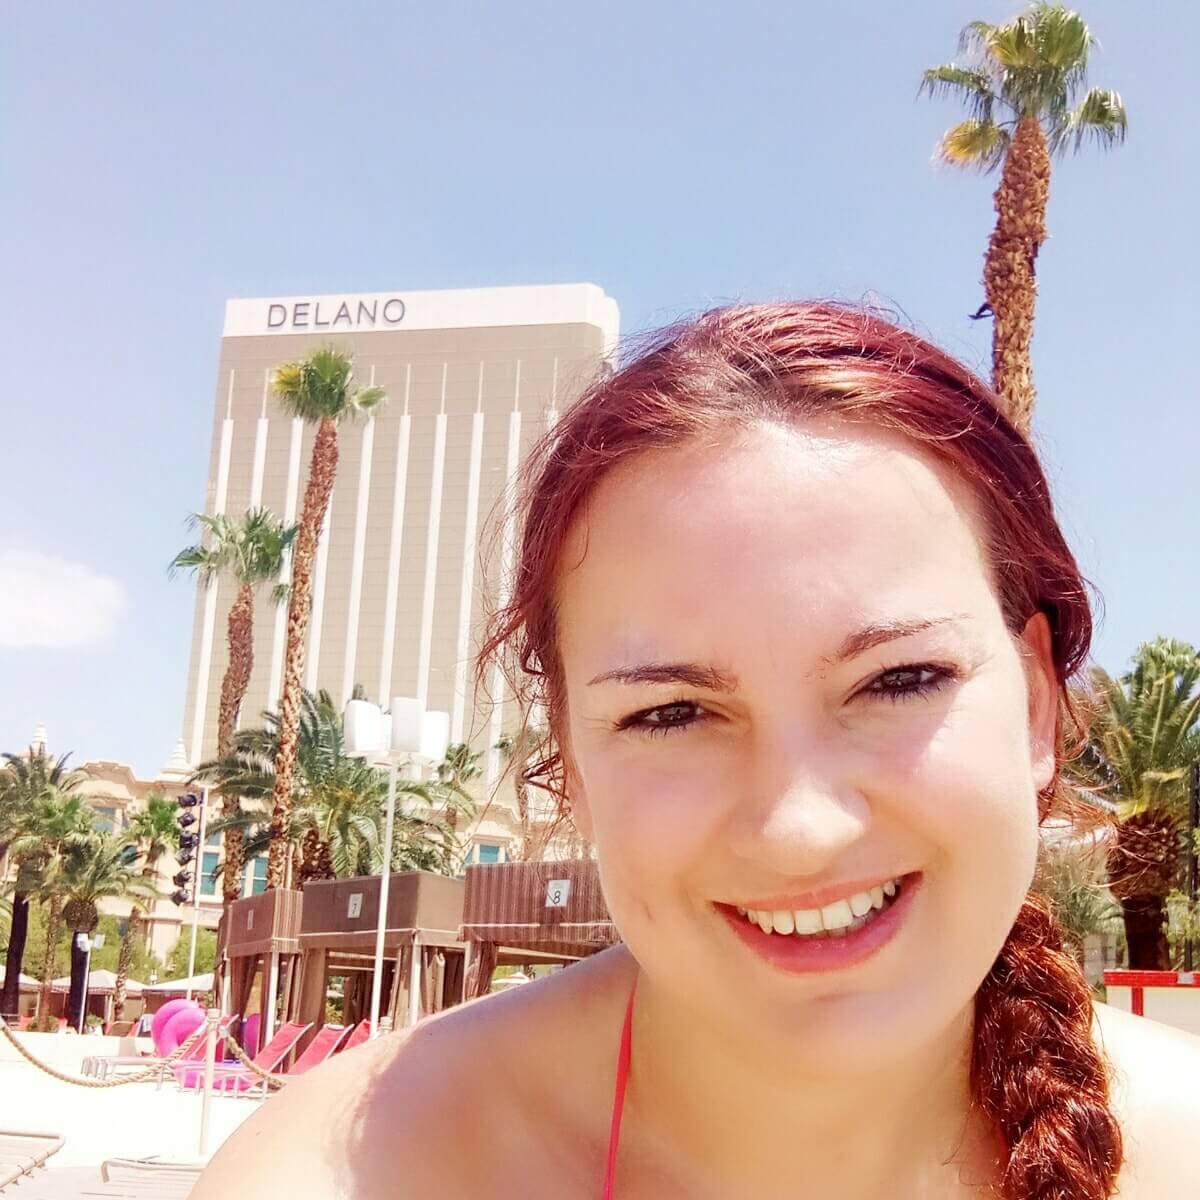 Visiting Las Vegas in the heat of summer